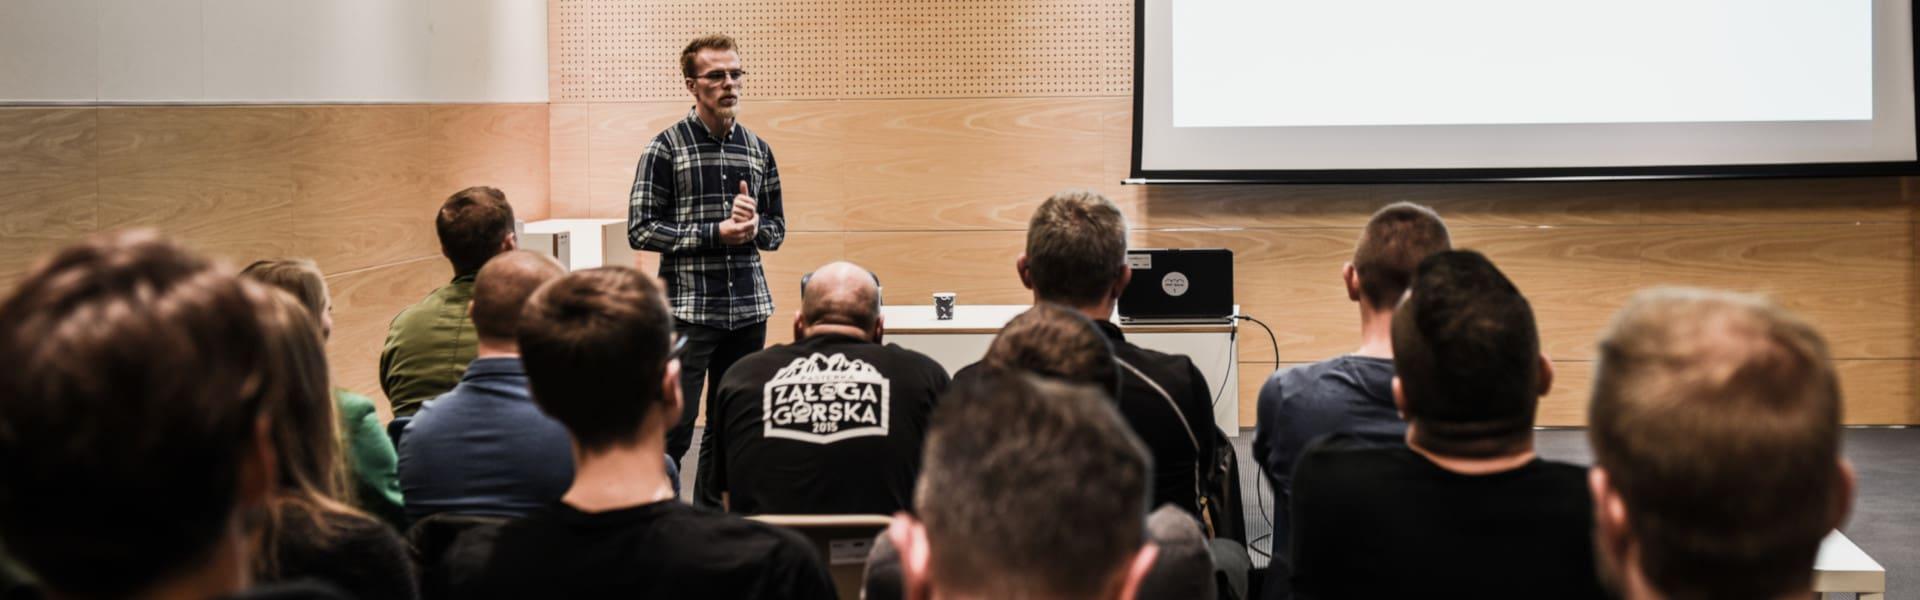 Szymon Leyk – trener programowania